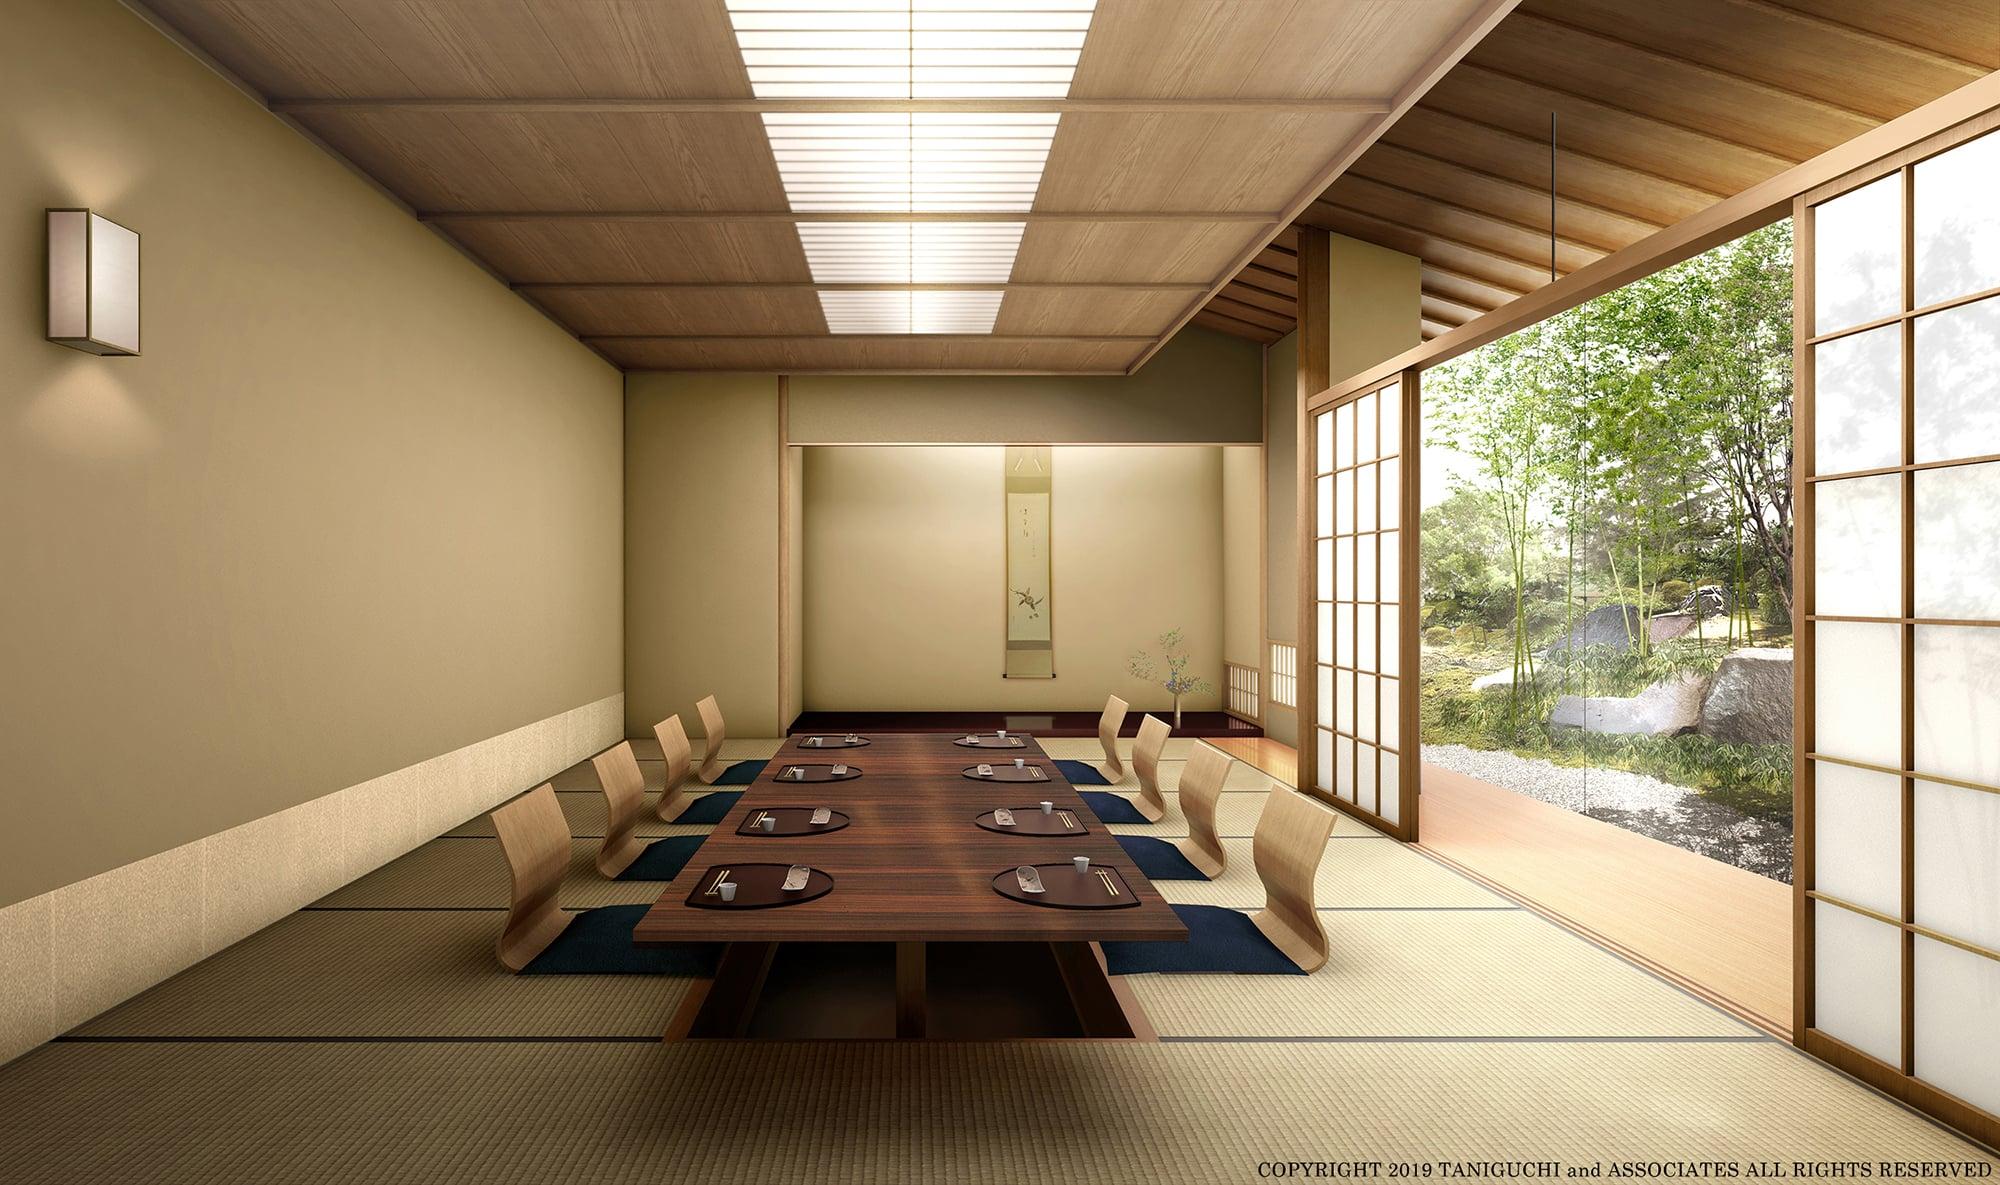 The Okura Tokyoの山里の個室イメージ。